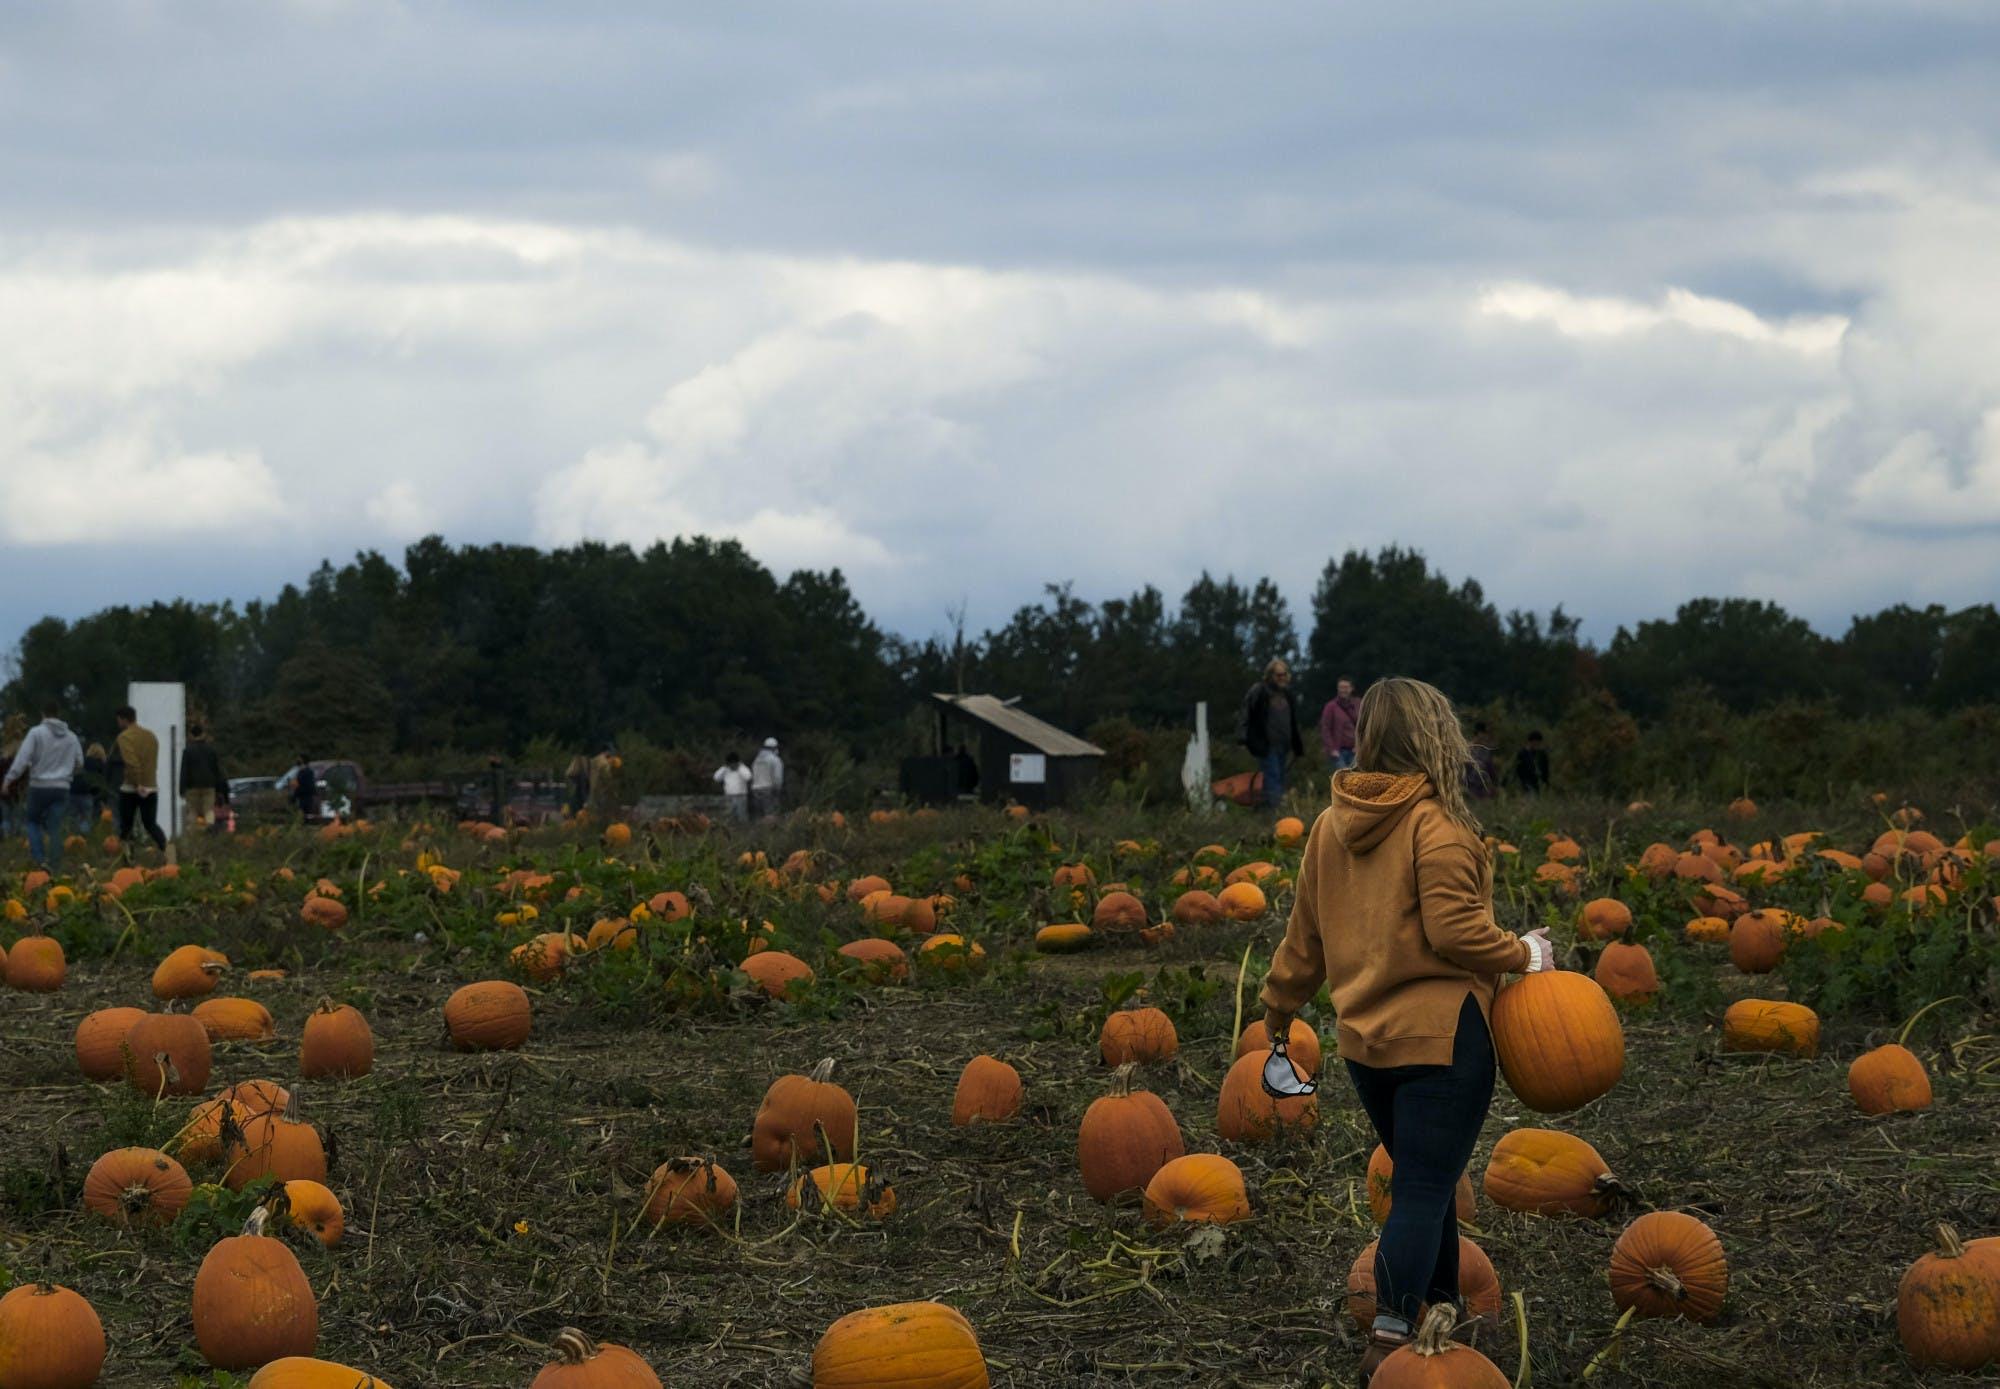 A person walks through a pumpkin patch while carrying a pumpkin.